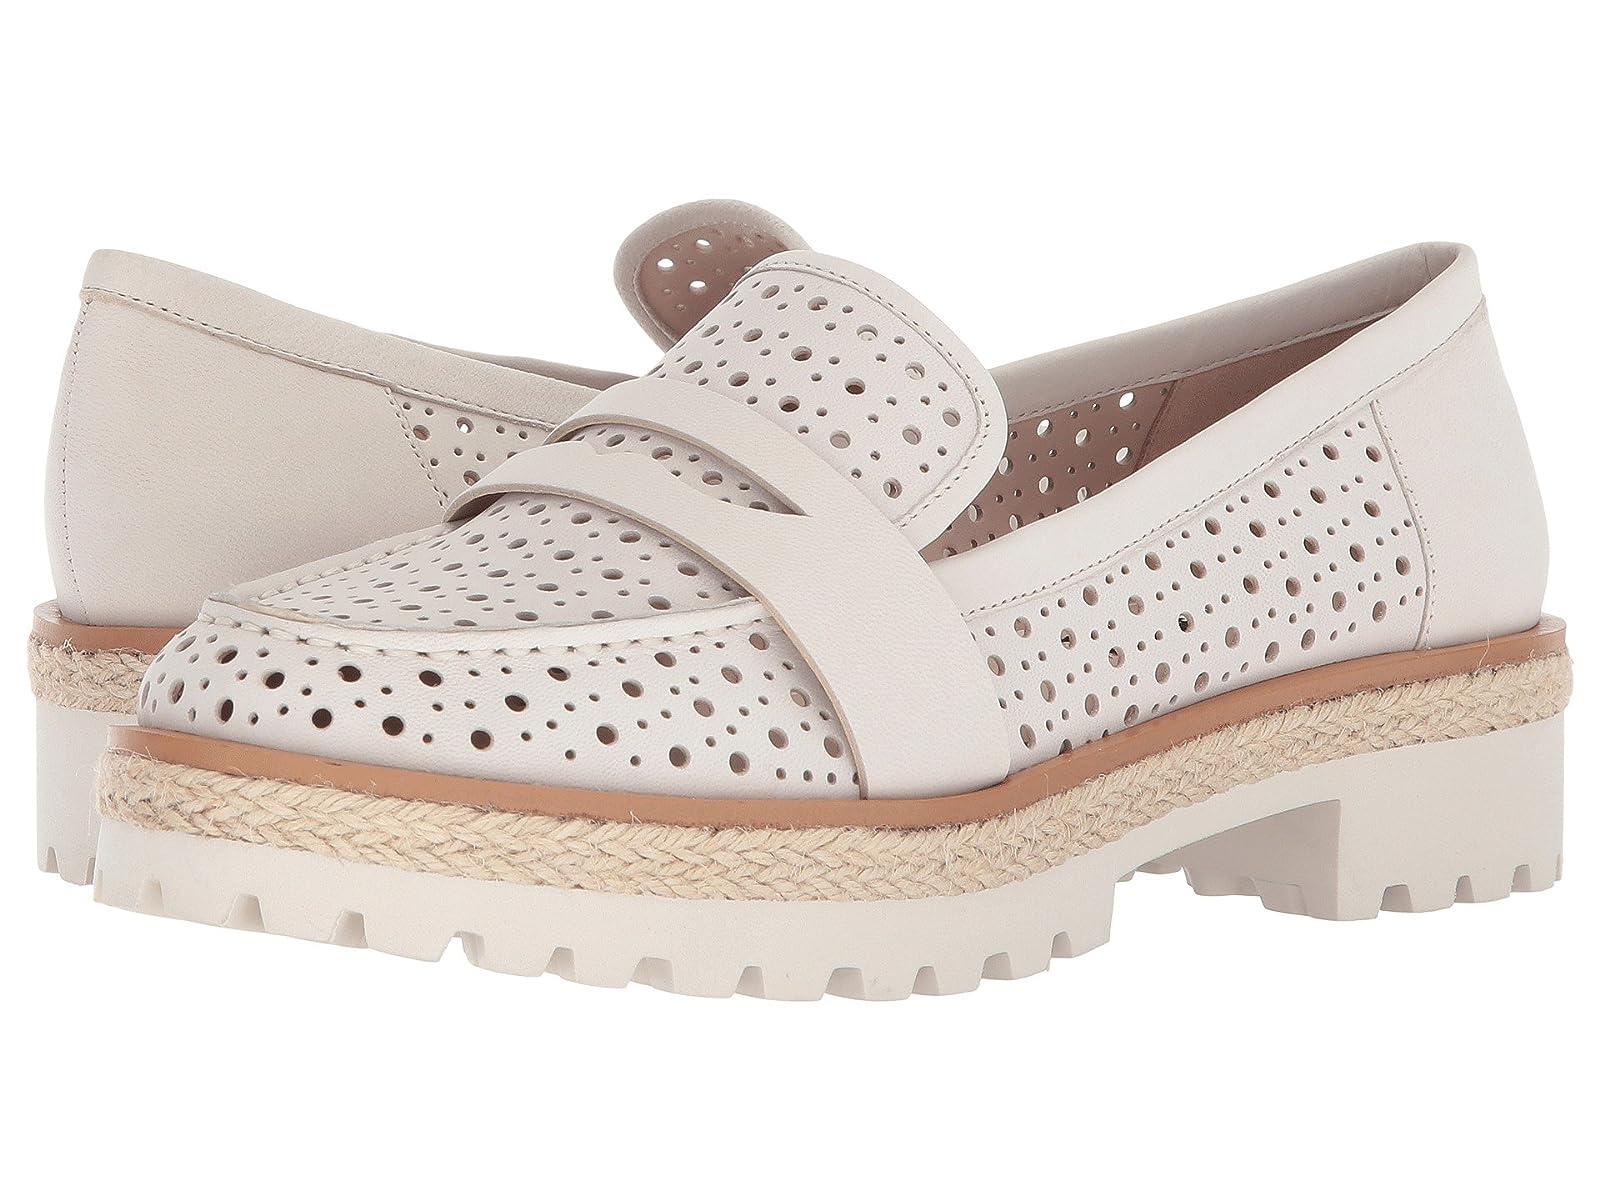 Nine West Gradskool LoaferCheap and distinctive eye-catching shoes